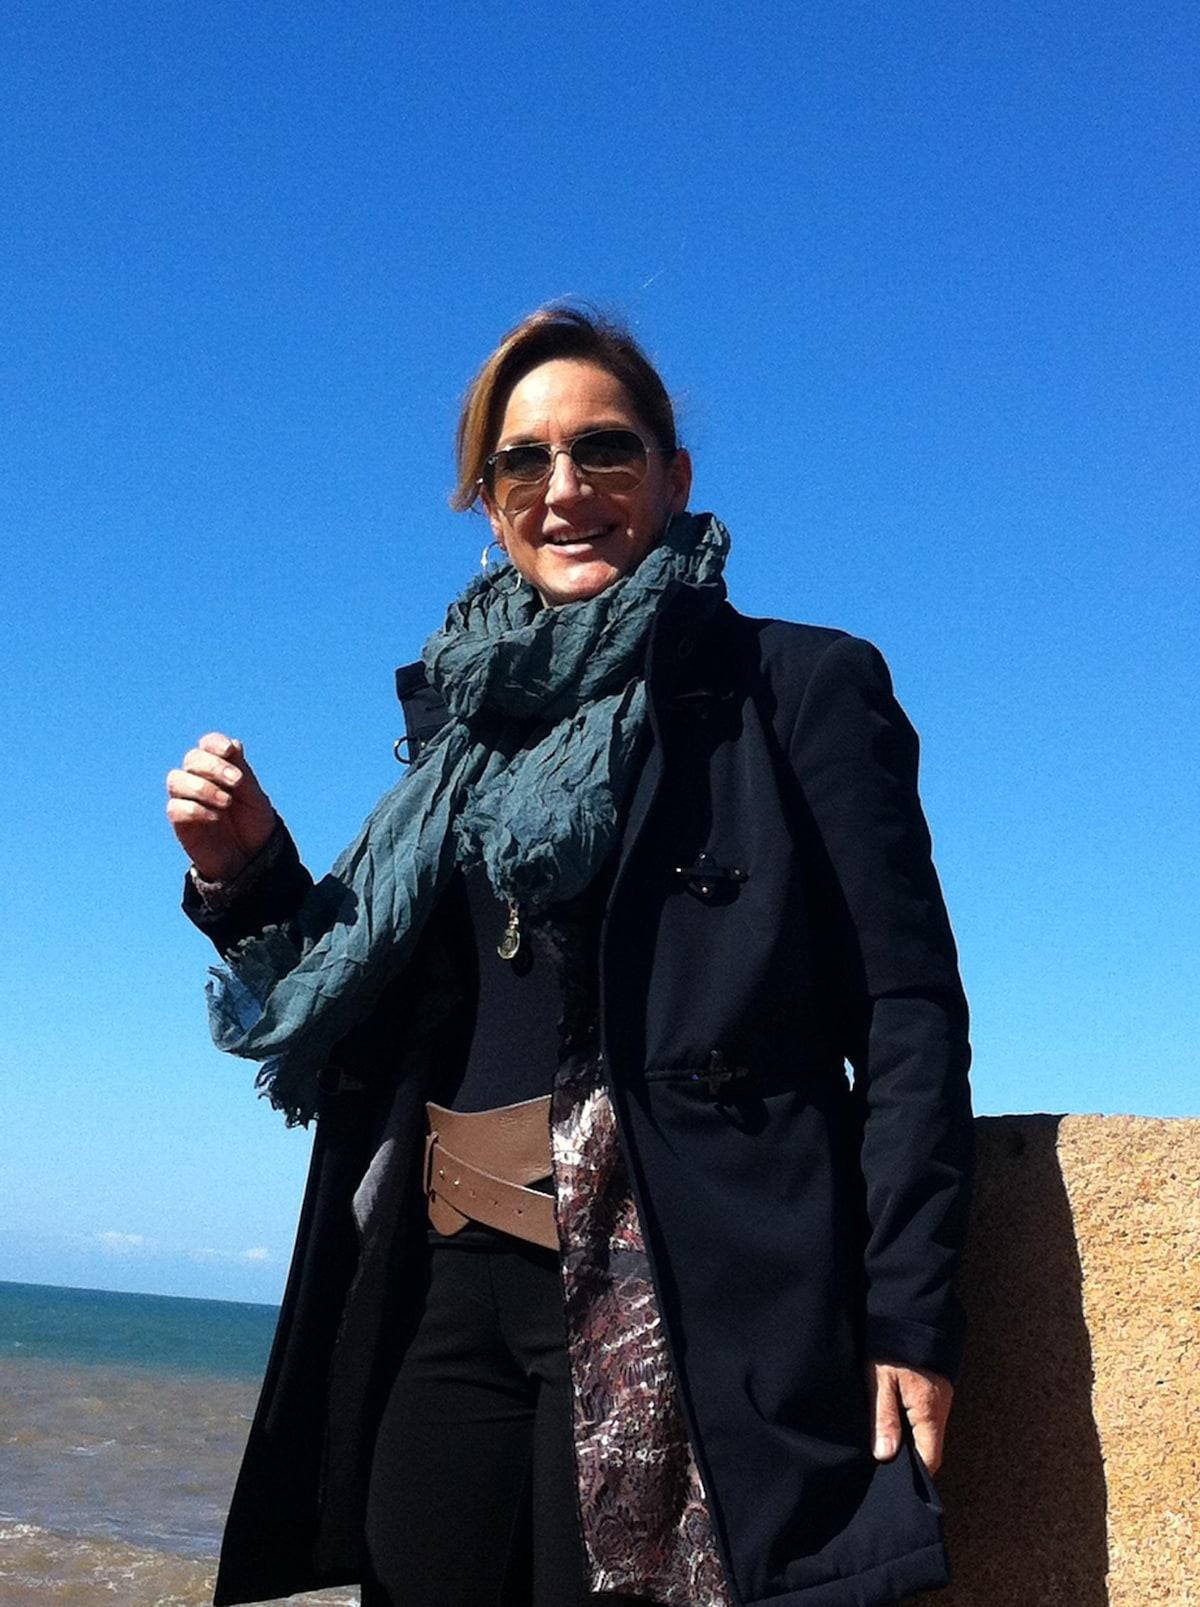 Giovanna From Vico Equense, Italy